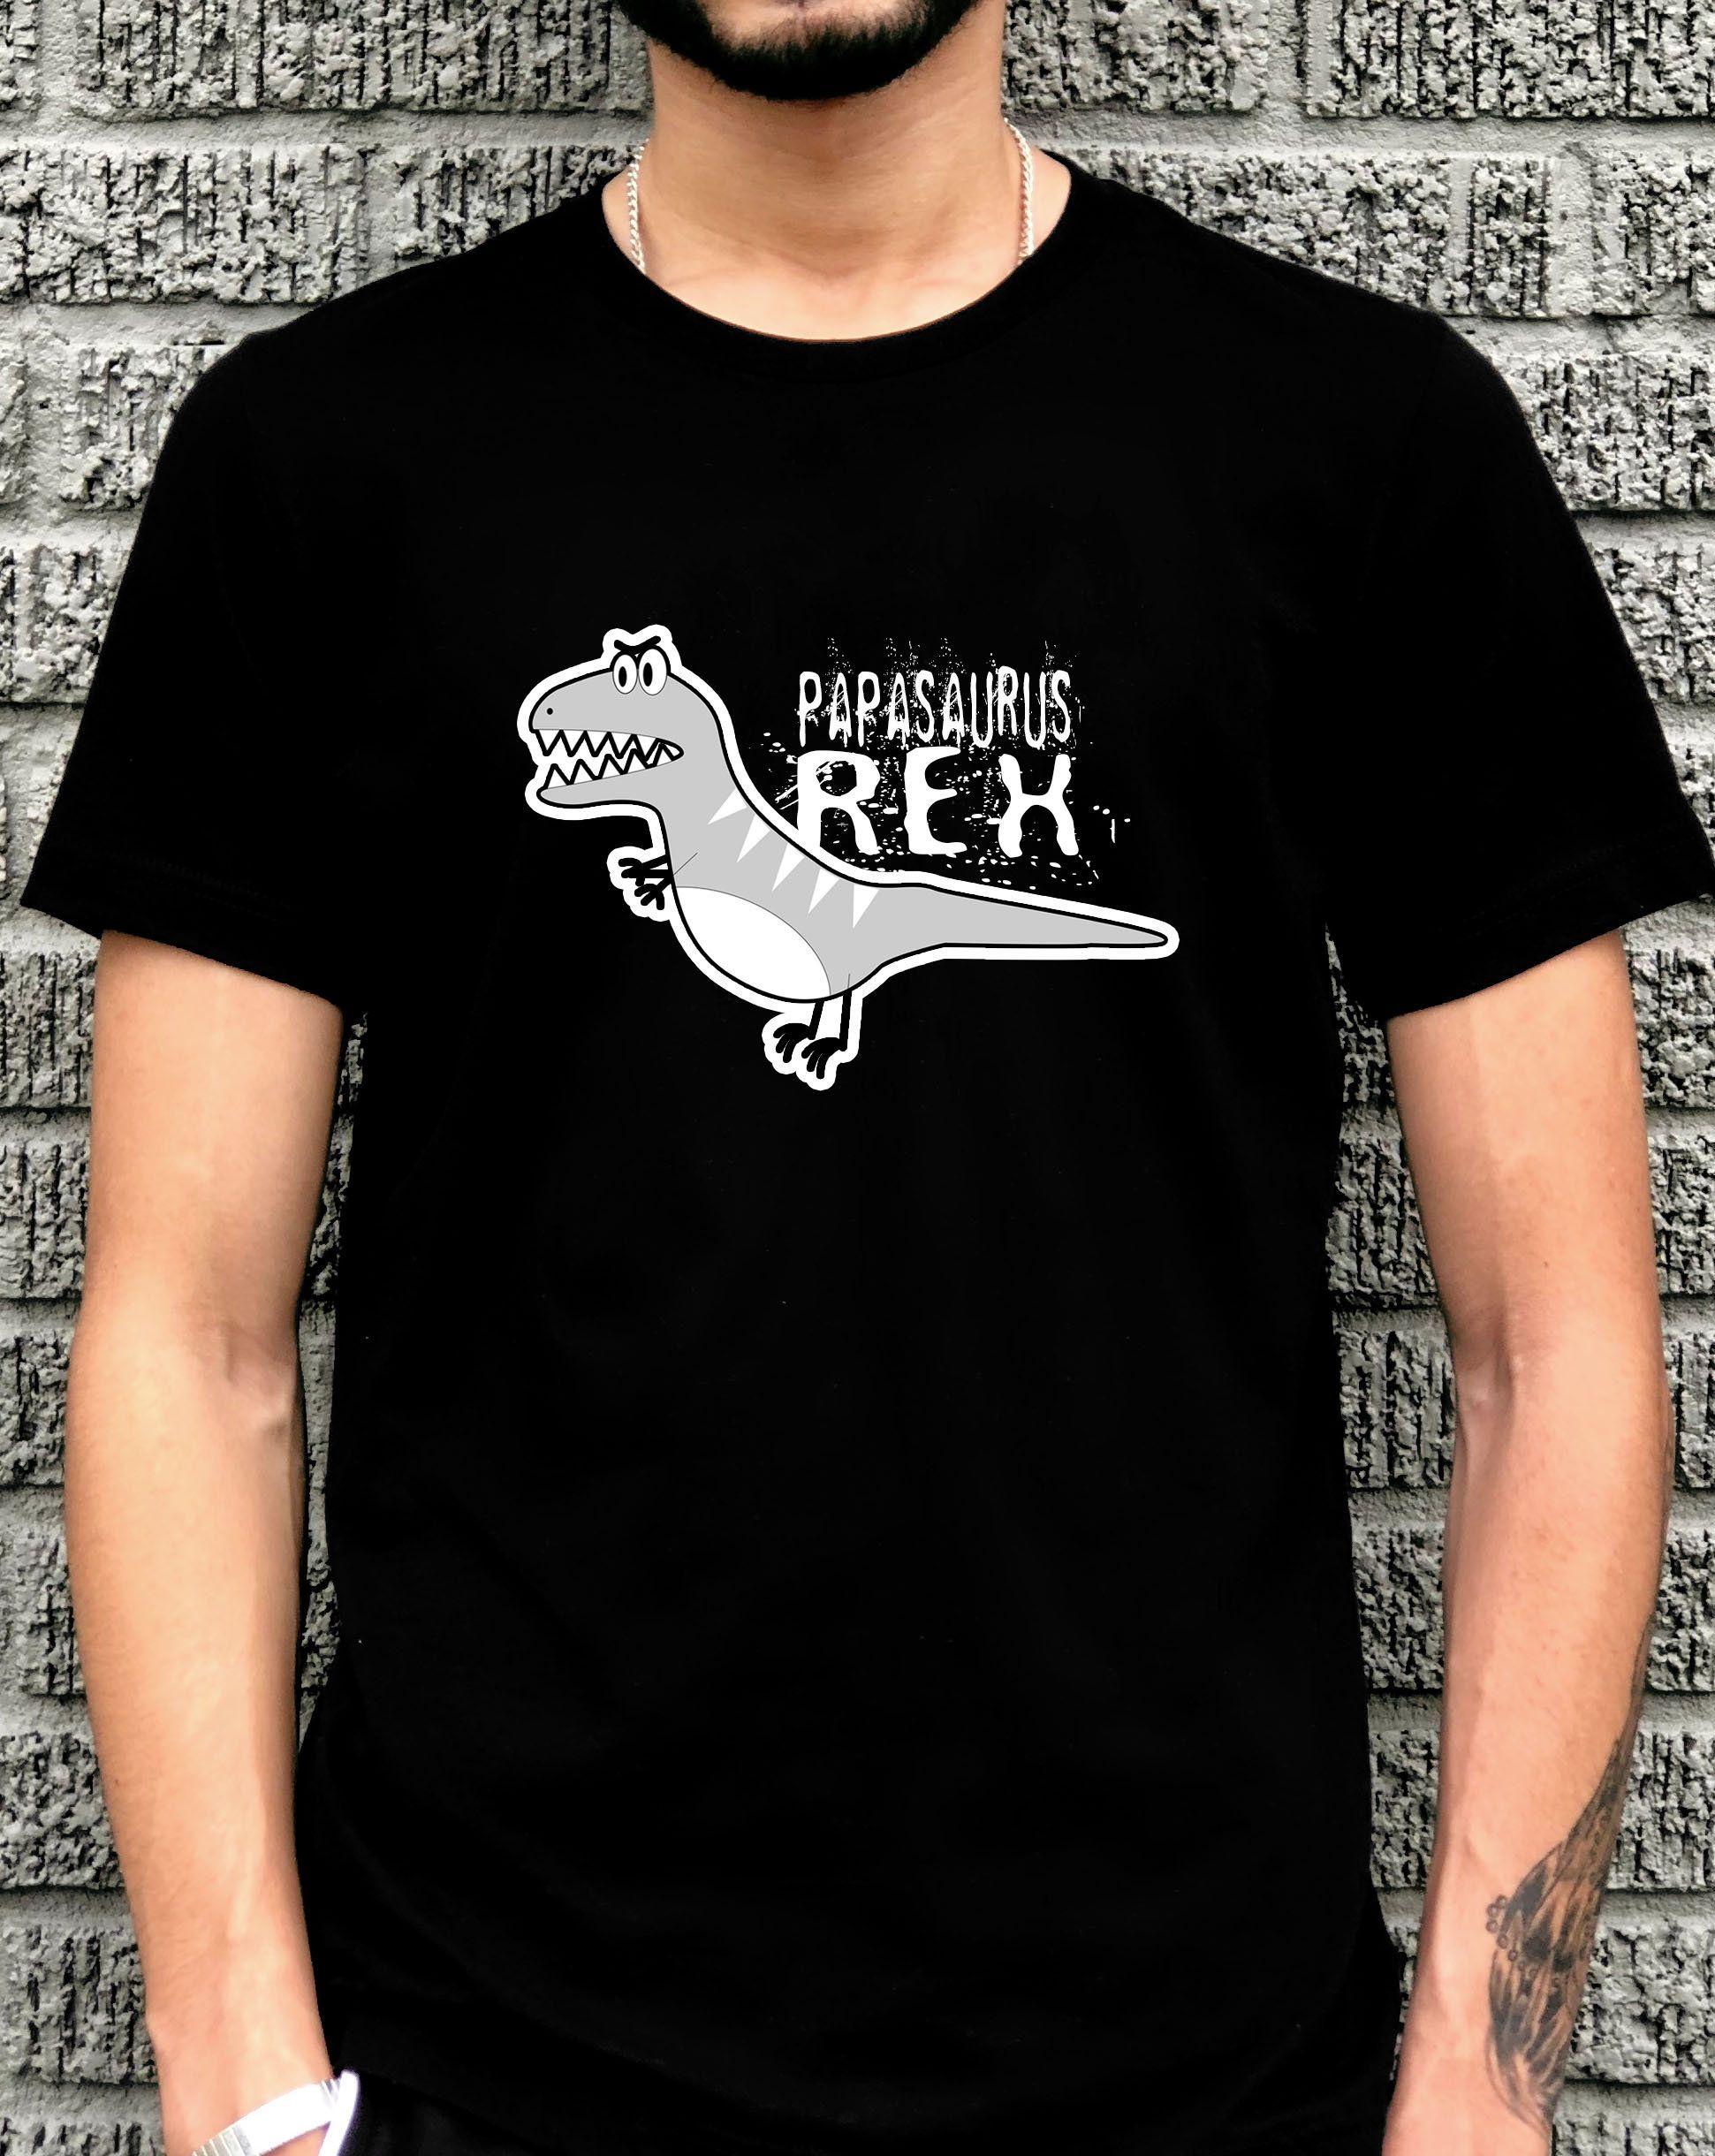 7aa86a65 Papasaurus T Shirt, Funny Dad T Shirt, Gift For Dad, Papa Shirt ...